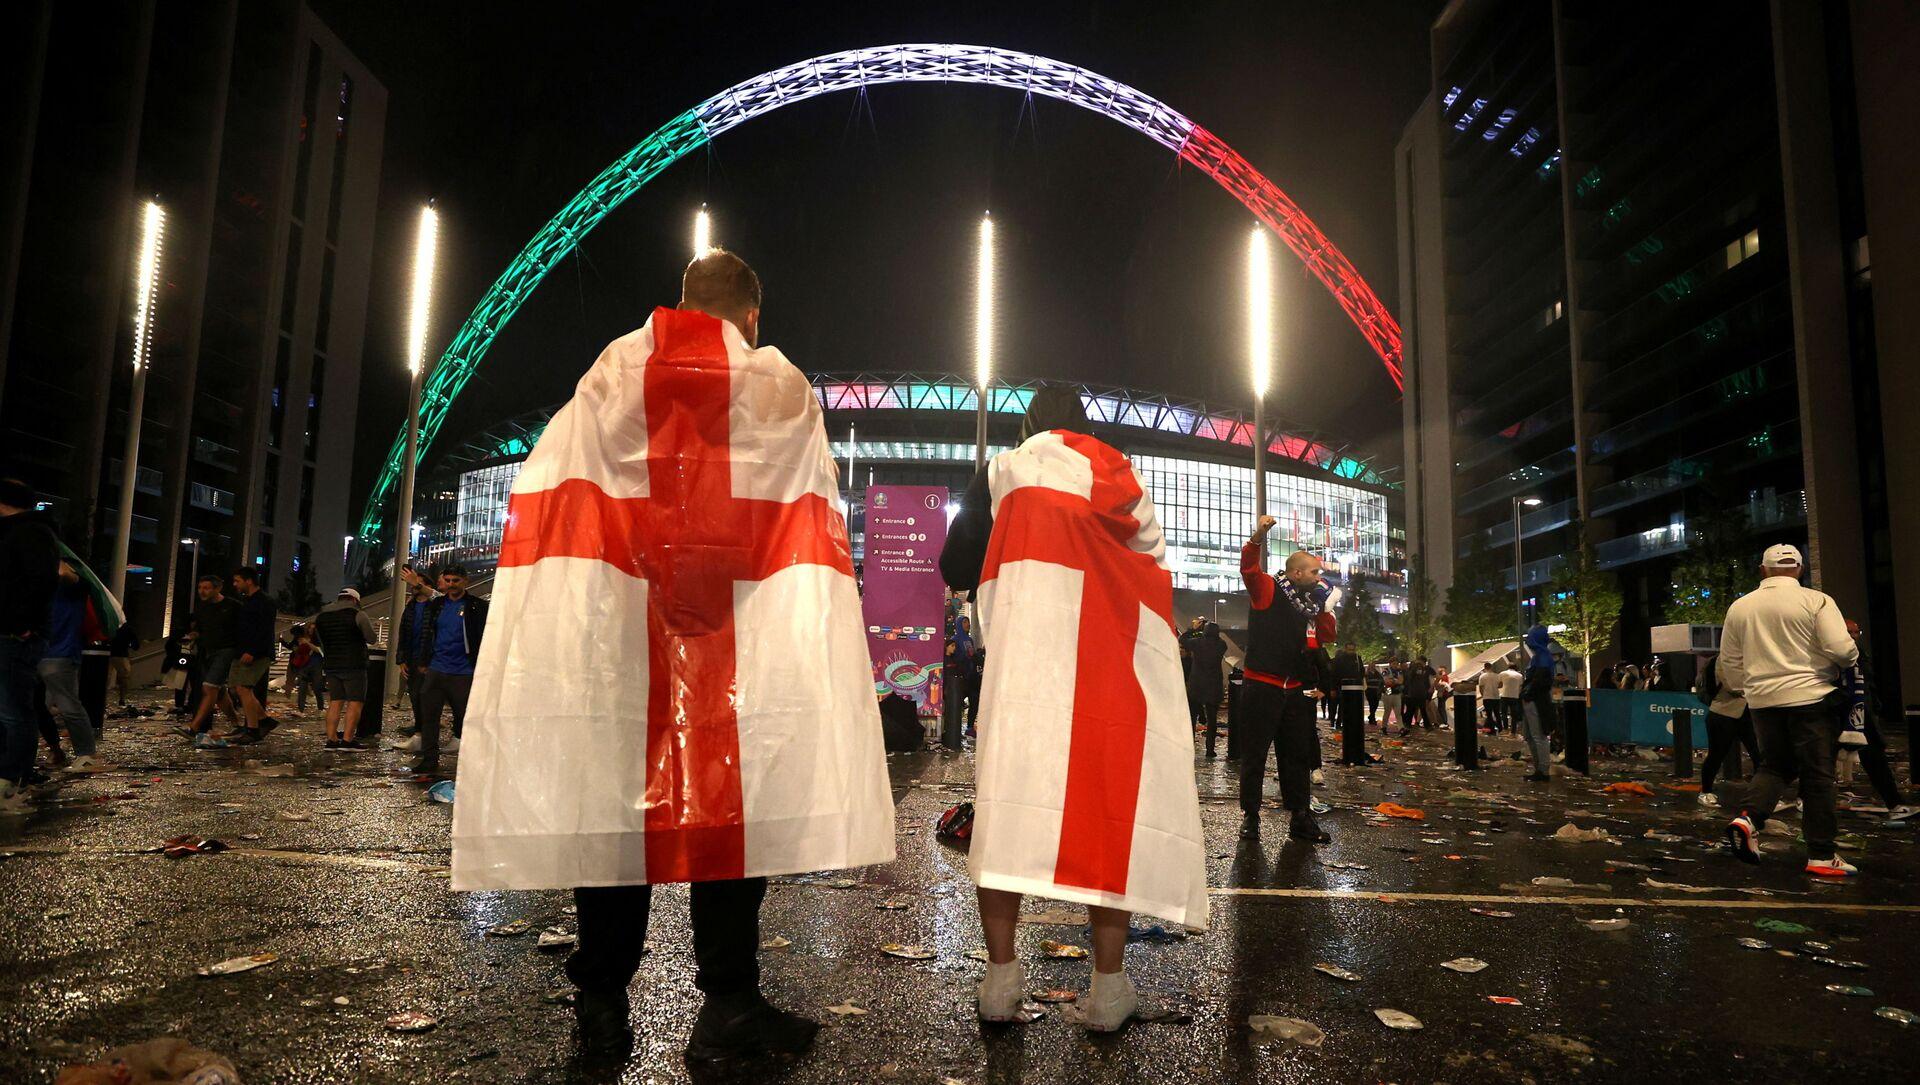 England fans outside Wembley Stadium after Italy wins the Euro 2020 final - Sputnik International, 1920, 12.07.2021